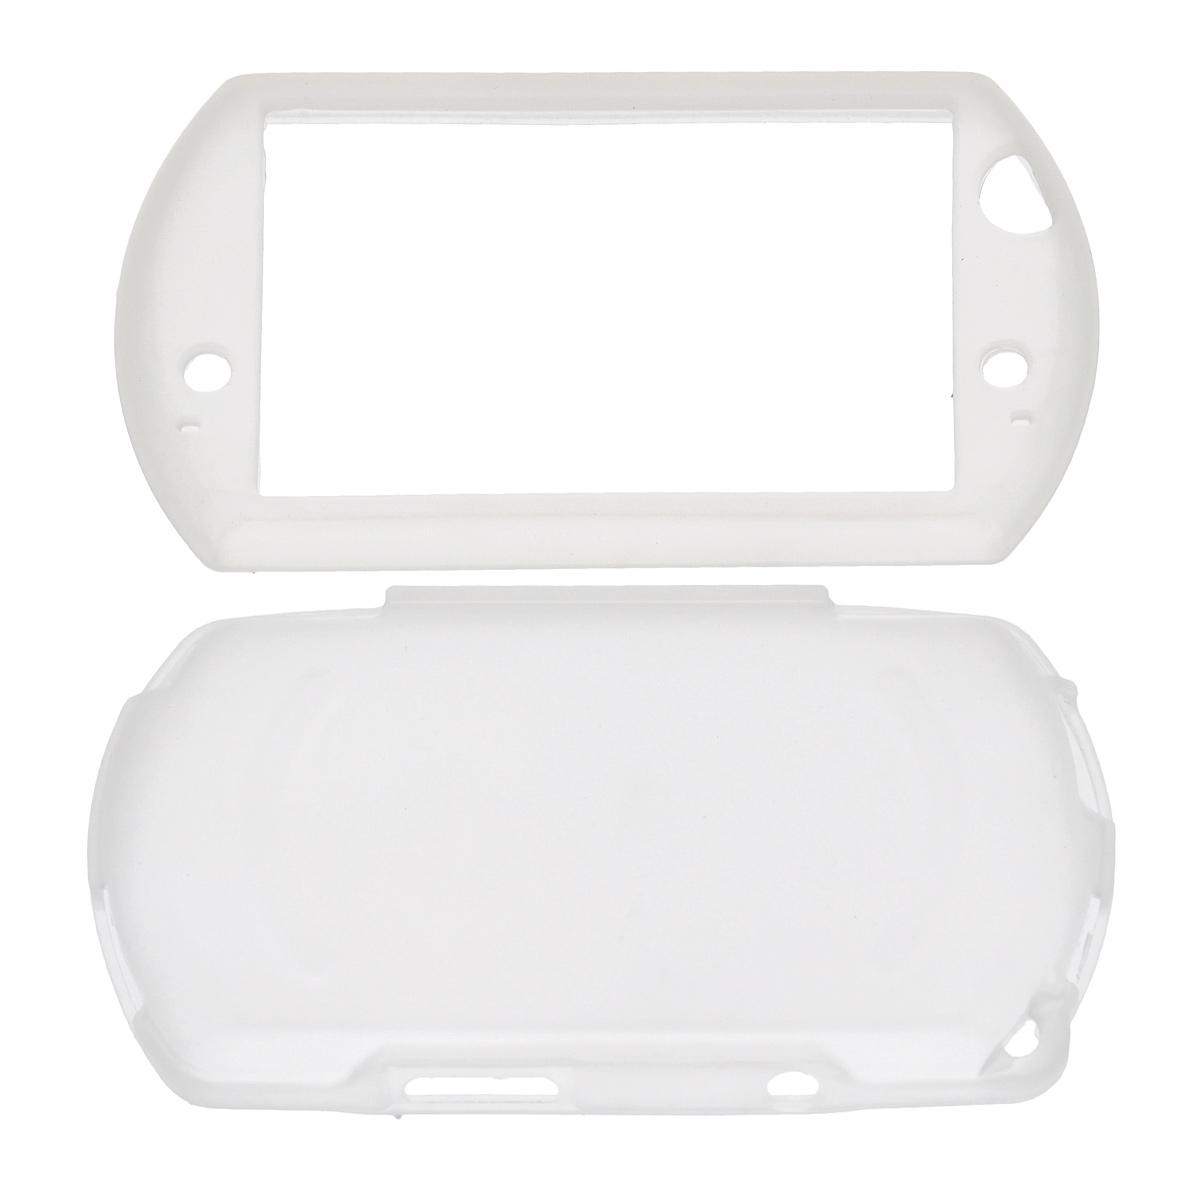 Game Guru Силиконовый чехол Silicon Sleeve для PSP Go PSPGO-Y048